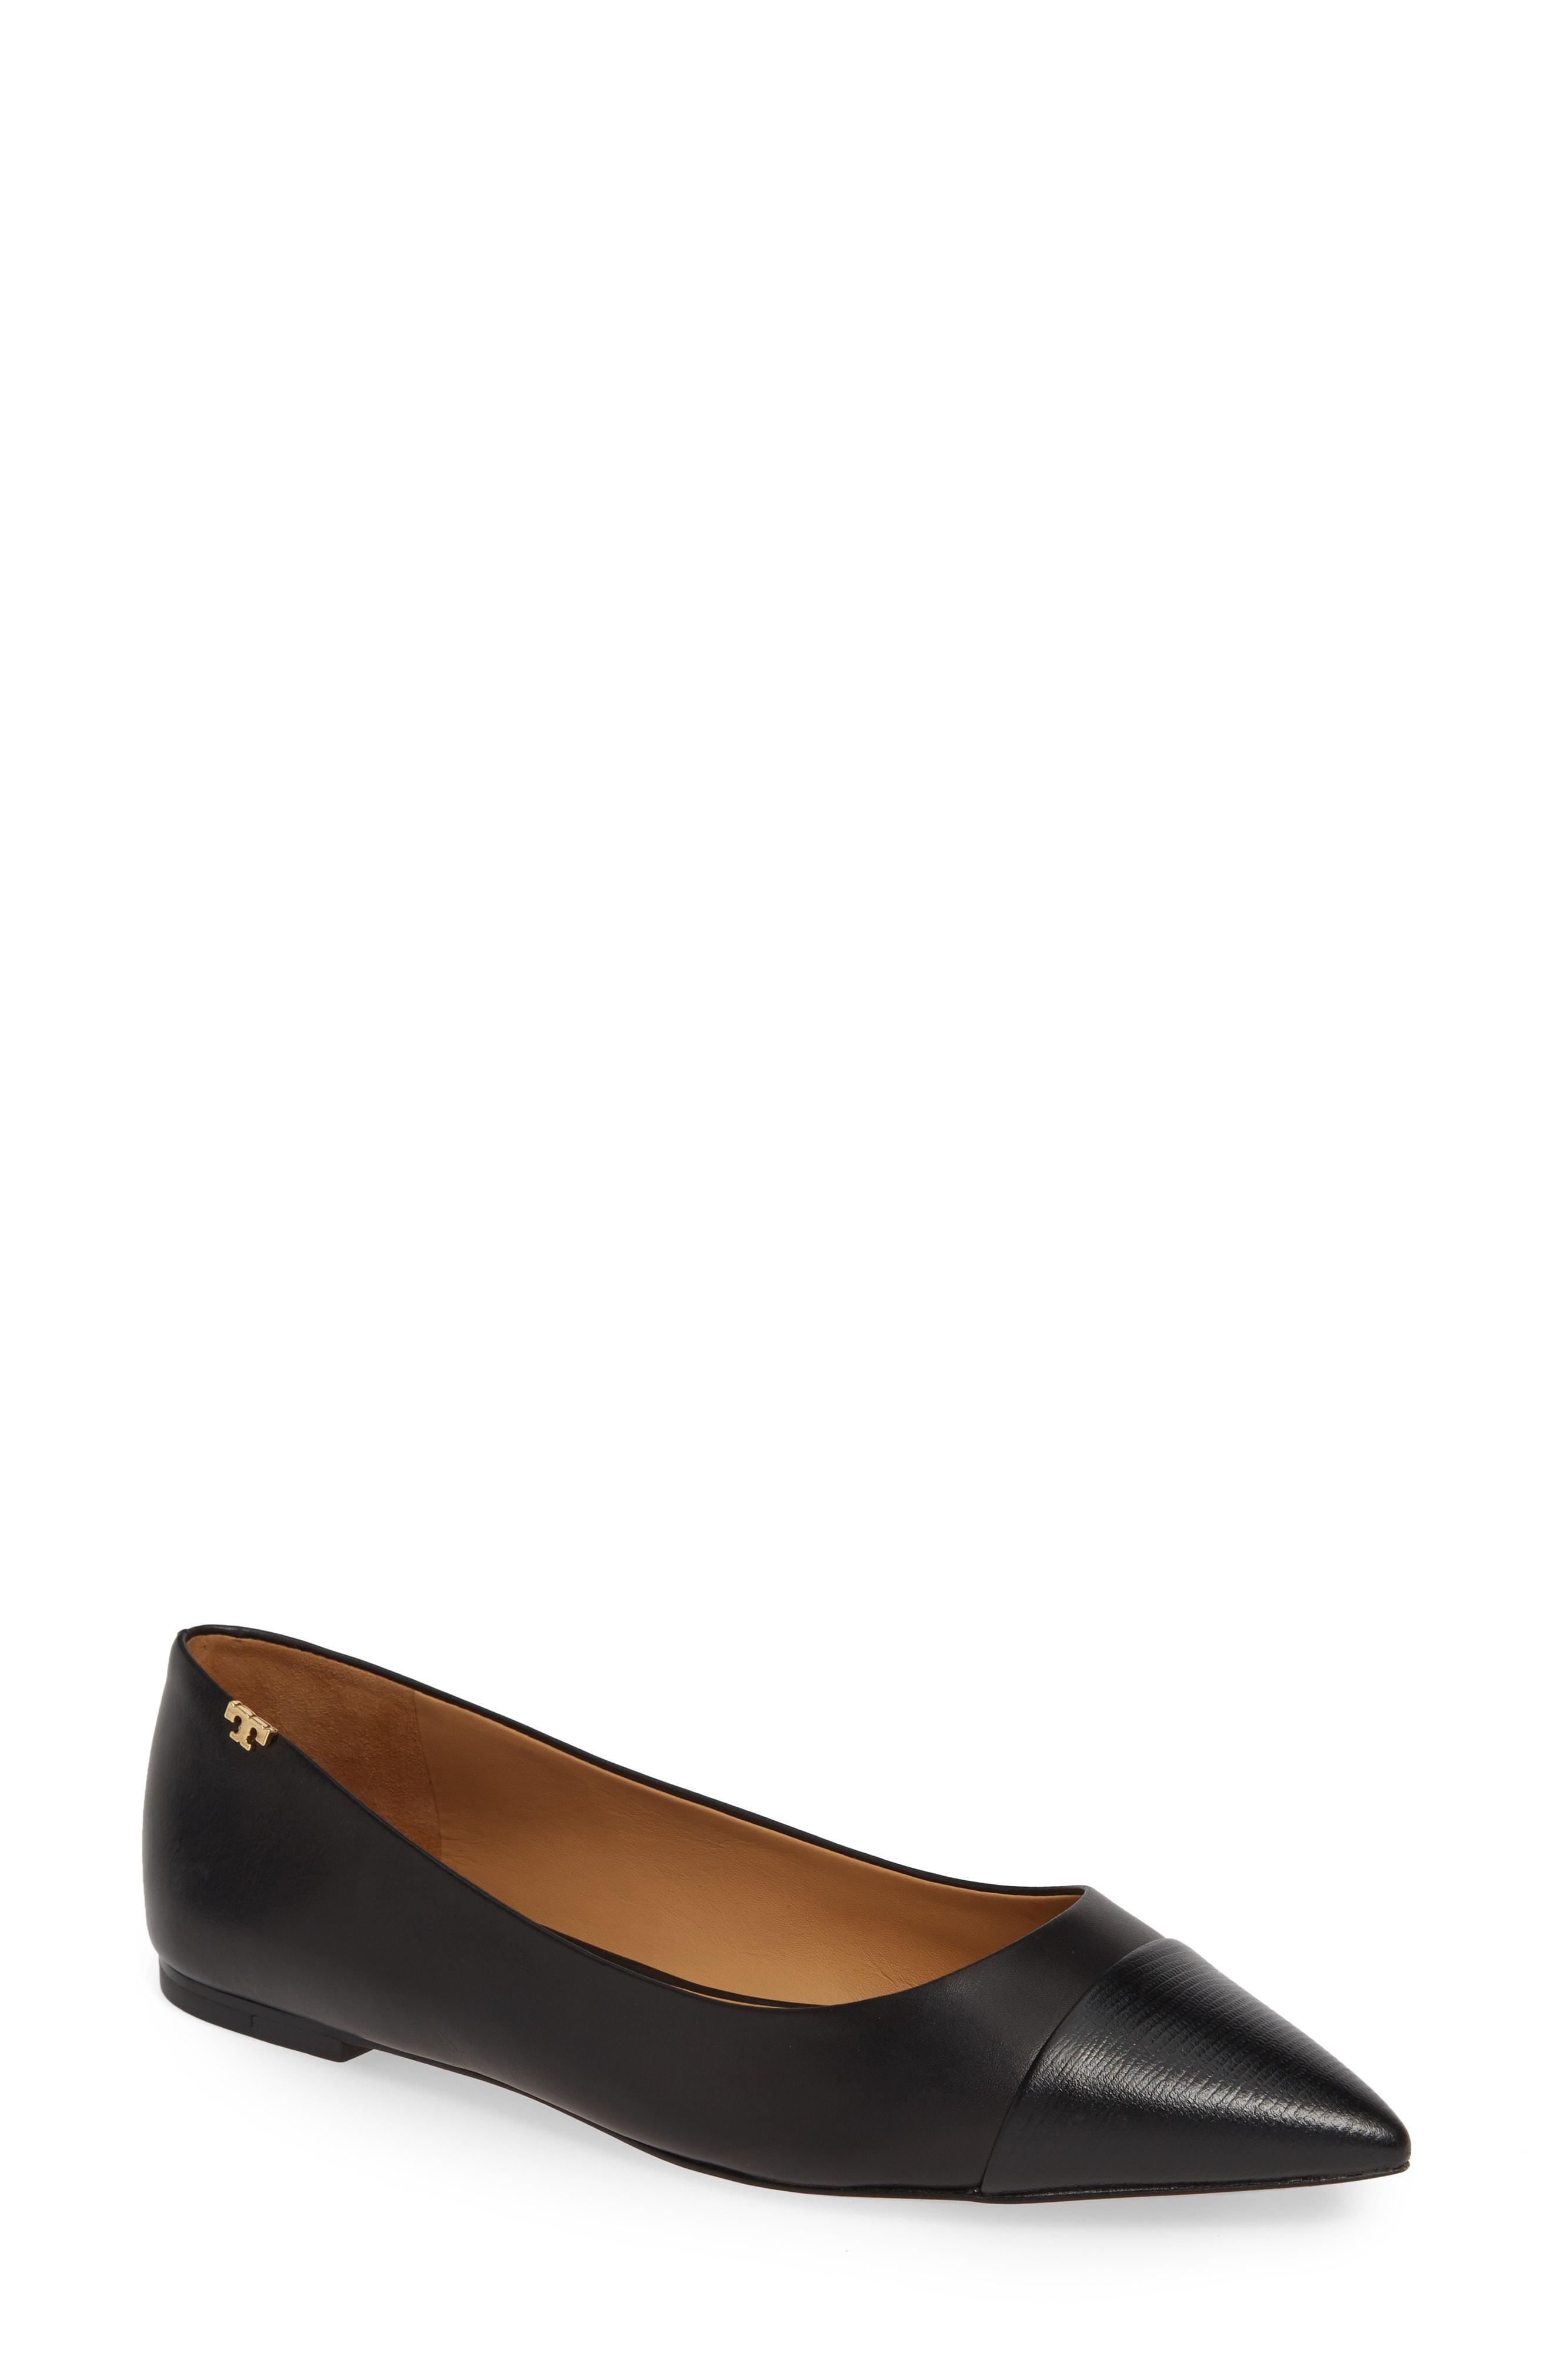 7b84f97356f1 Lyst - Tory Burch Angelina Cap Toe Flat in Black